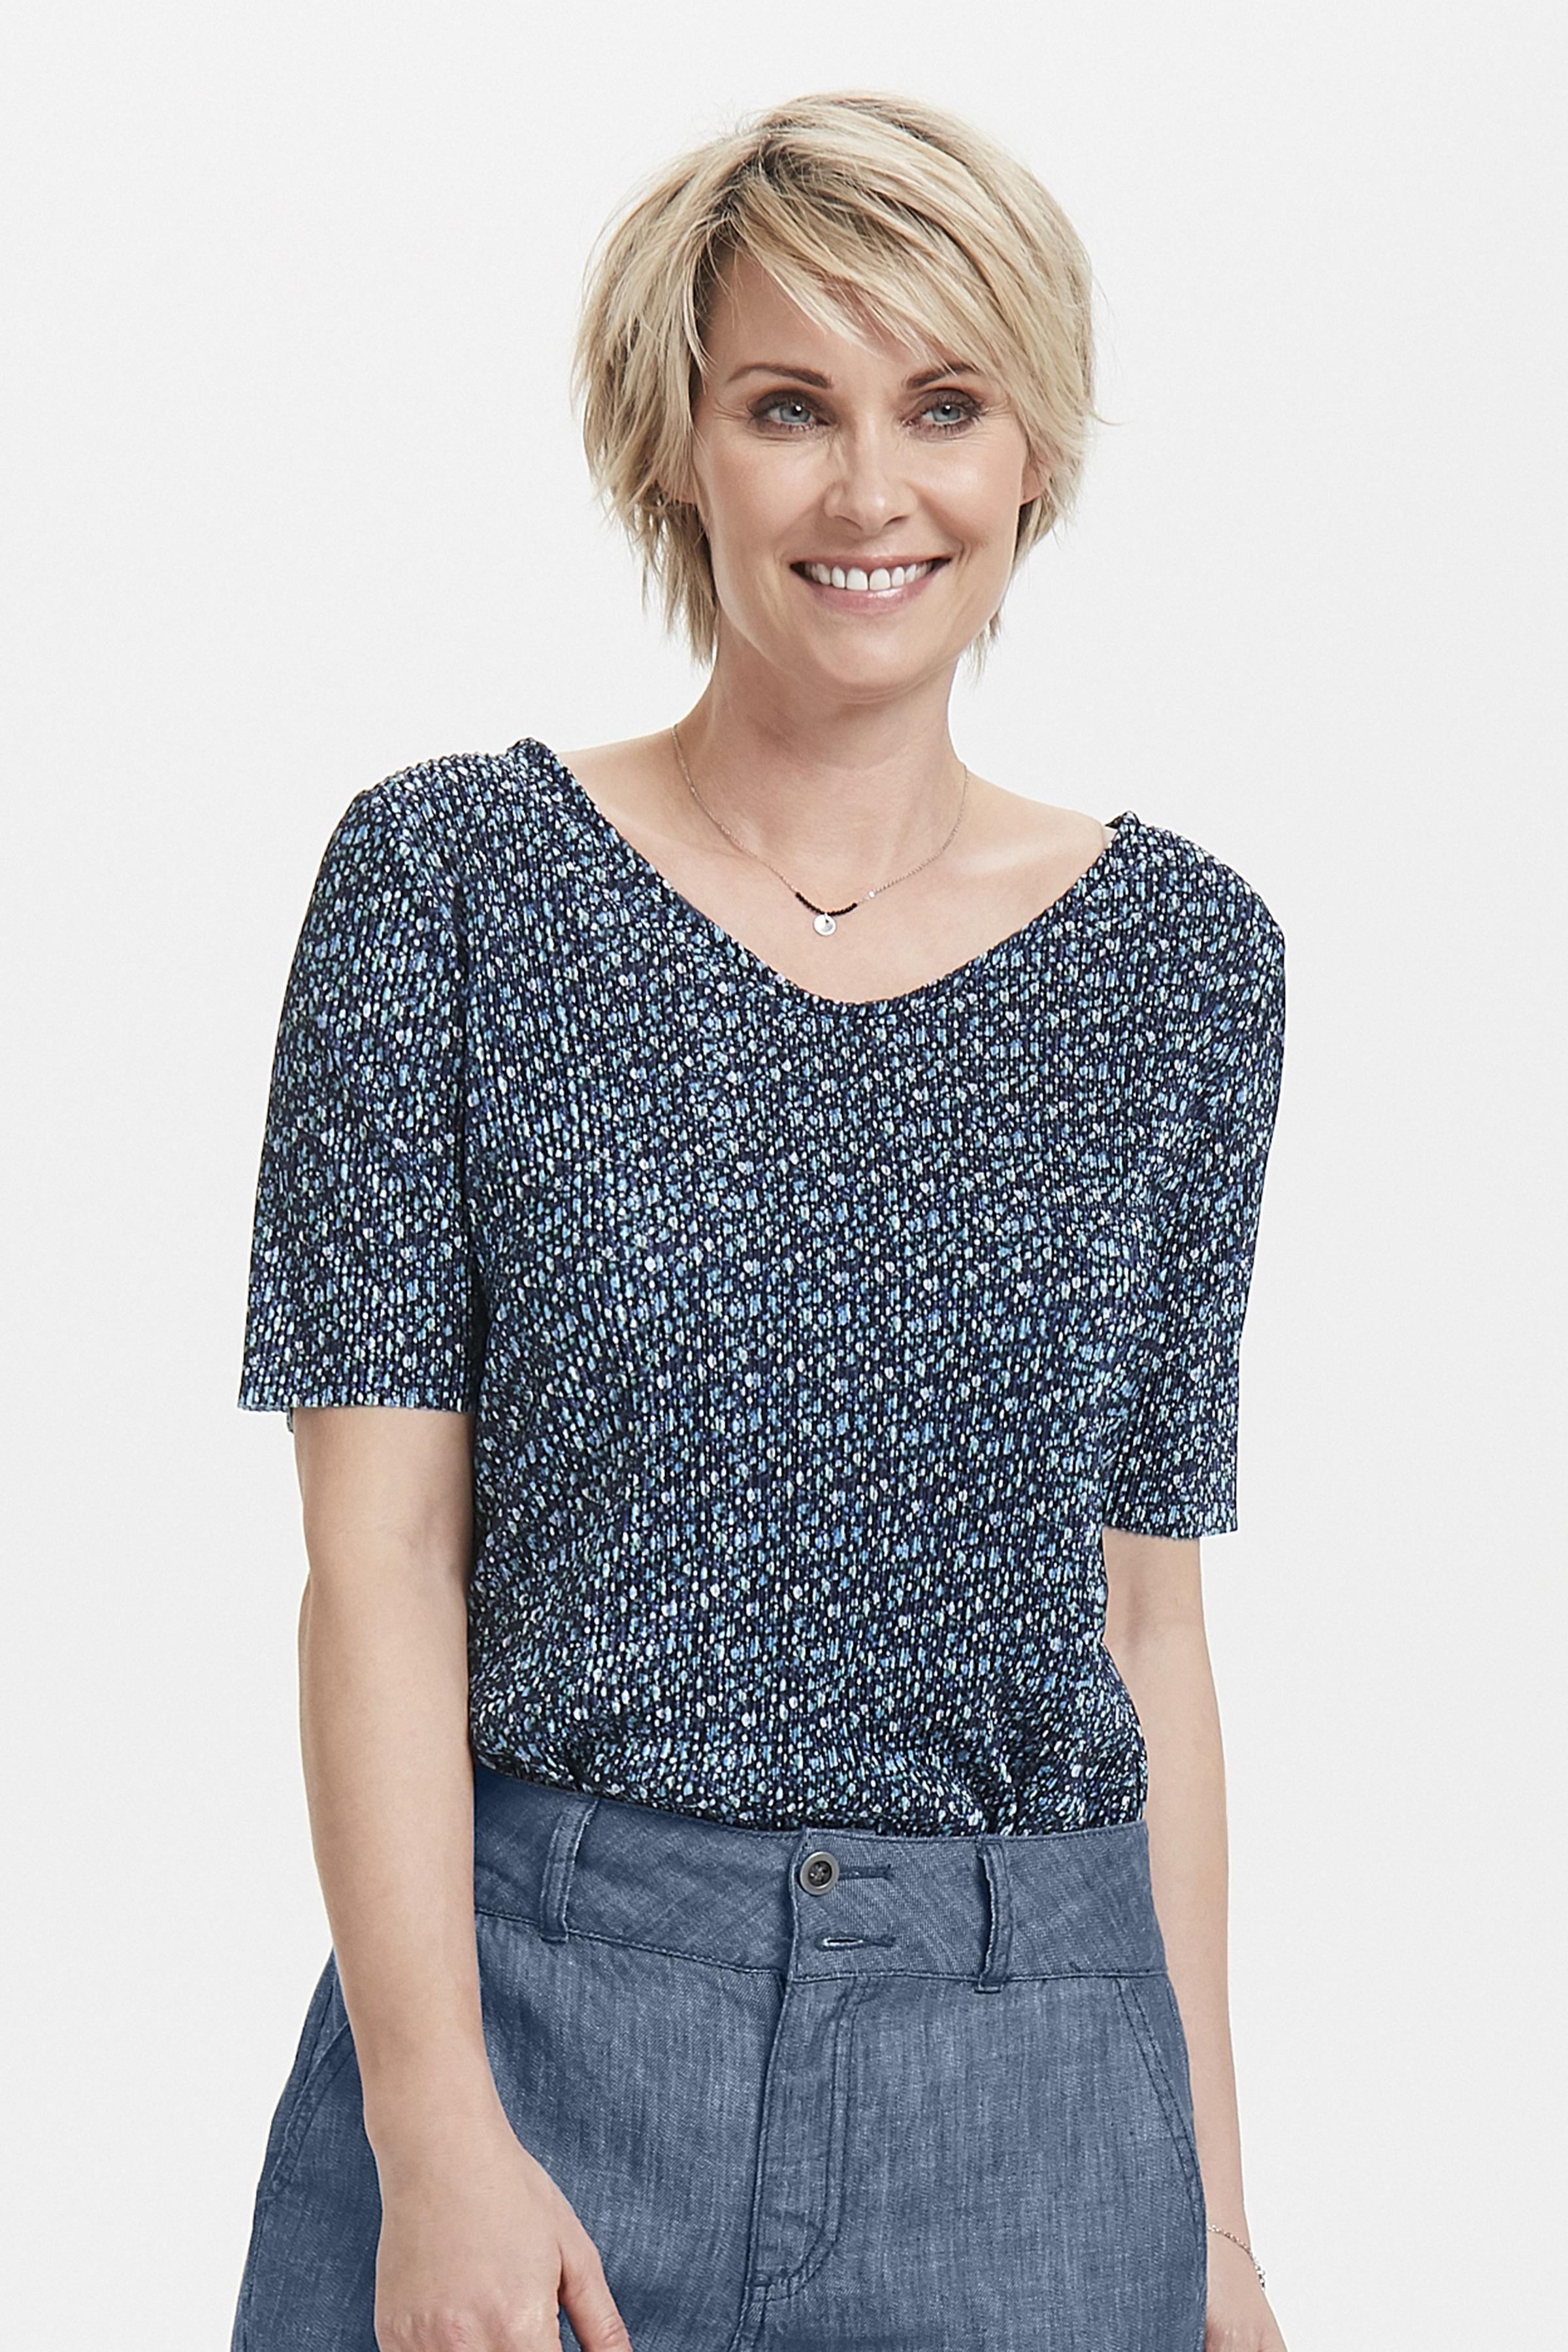 Marineblau/blau Kurzarm-Bluse von Fransa – Shoppen Sie Marineblau/blau Kurzarm-Bluse ab Gr. XS-XXL hier